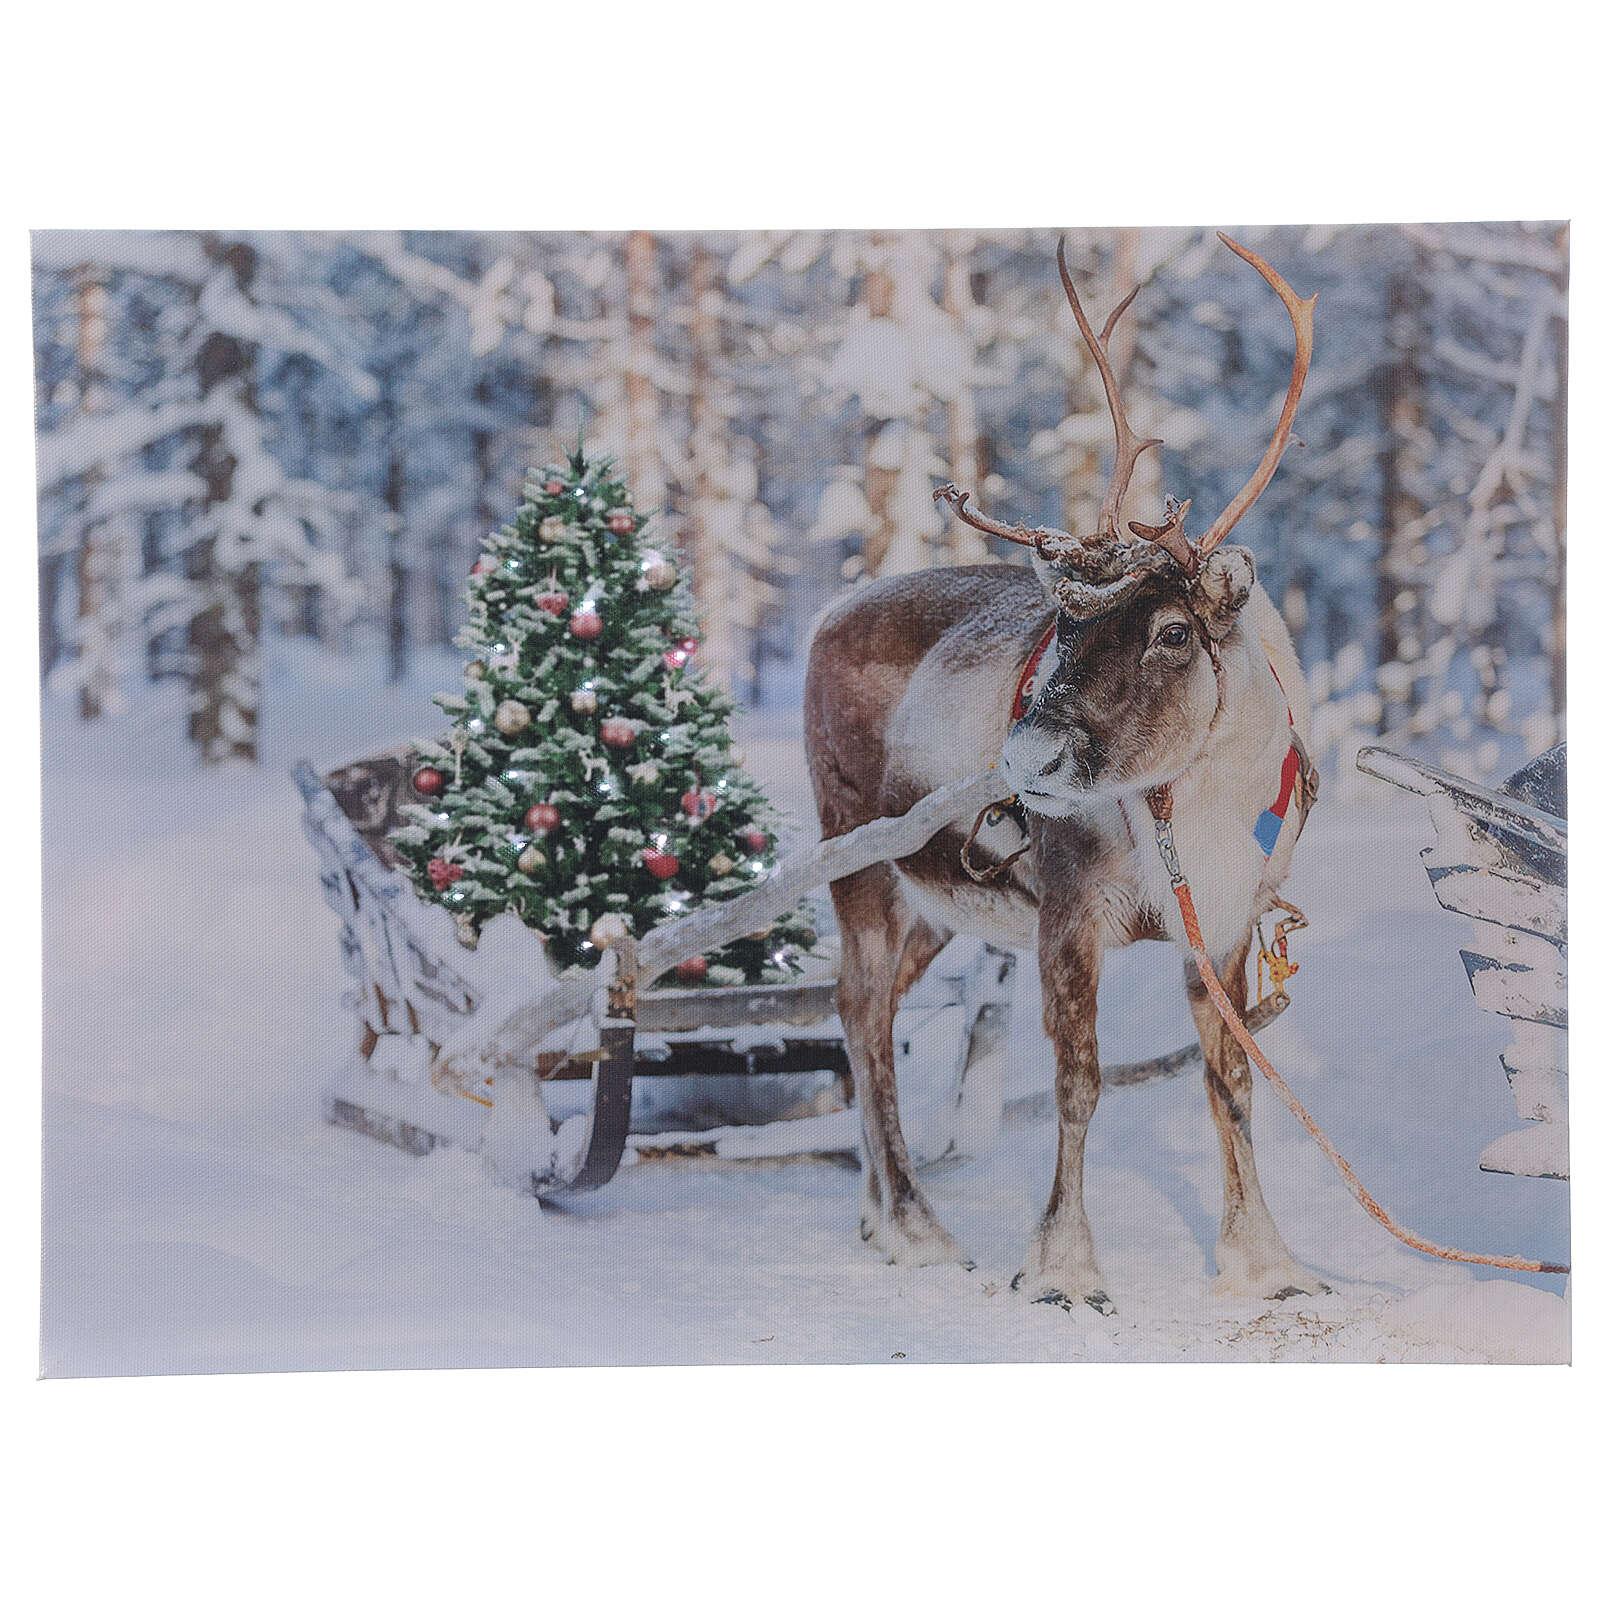 Reindeer with sleigh, fiber optic lighted Christmas wall art, 30x40 cm 3